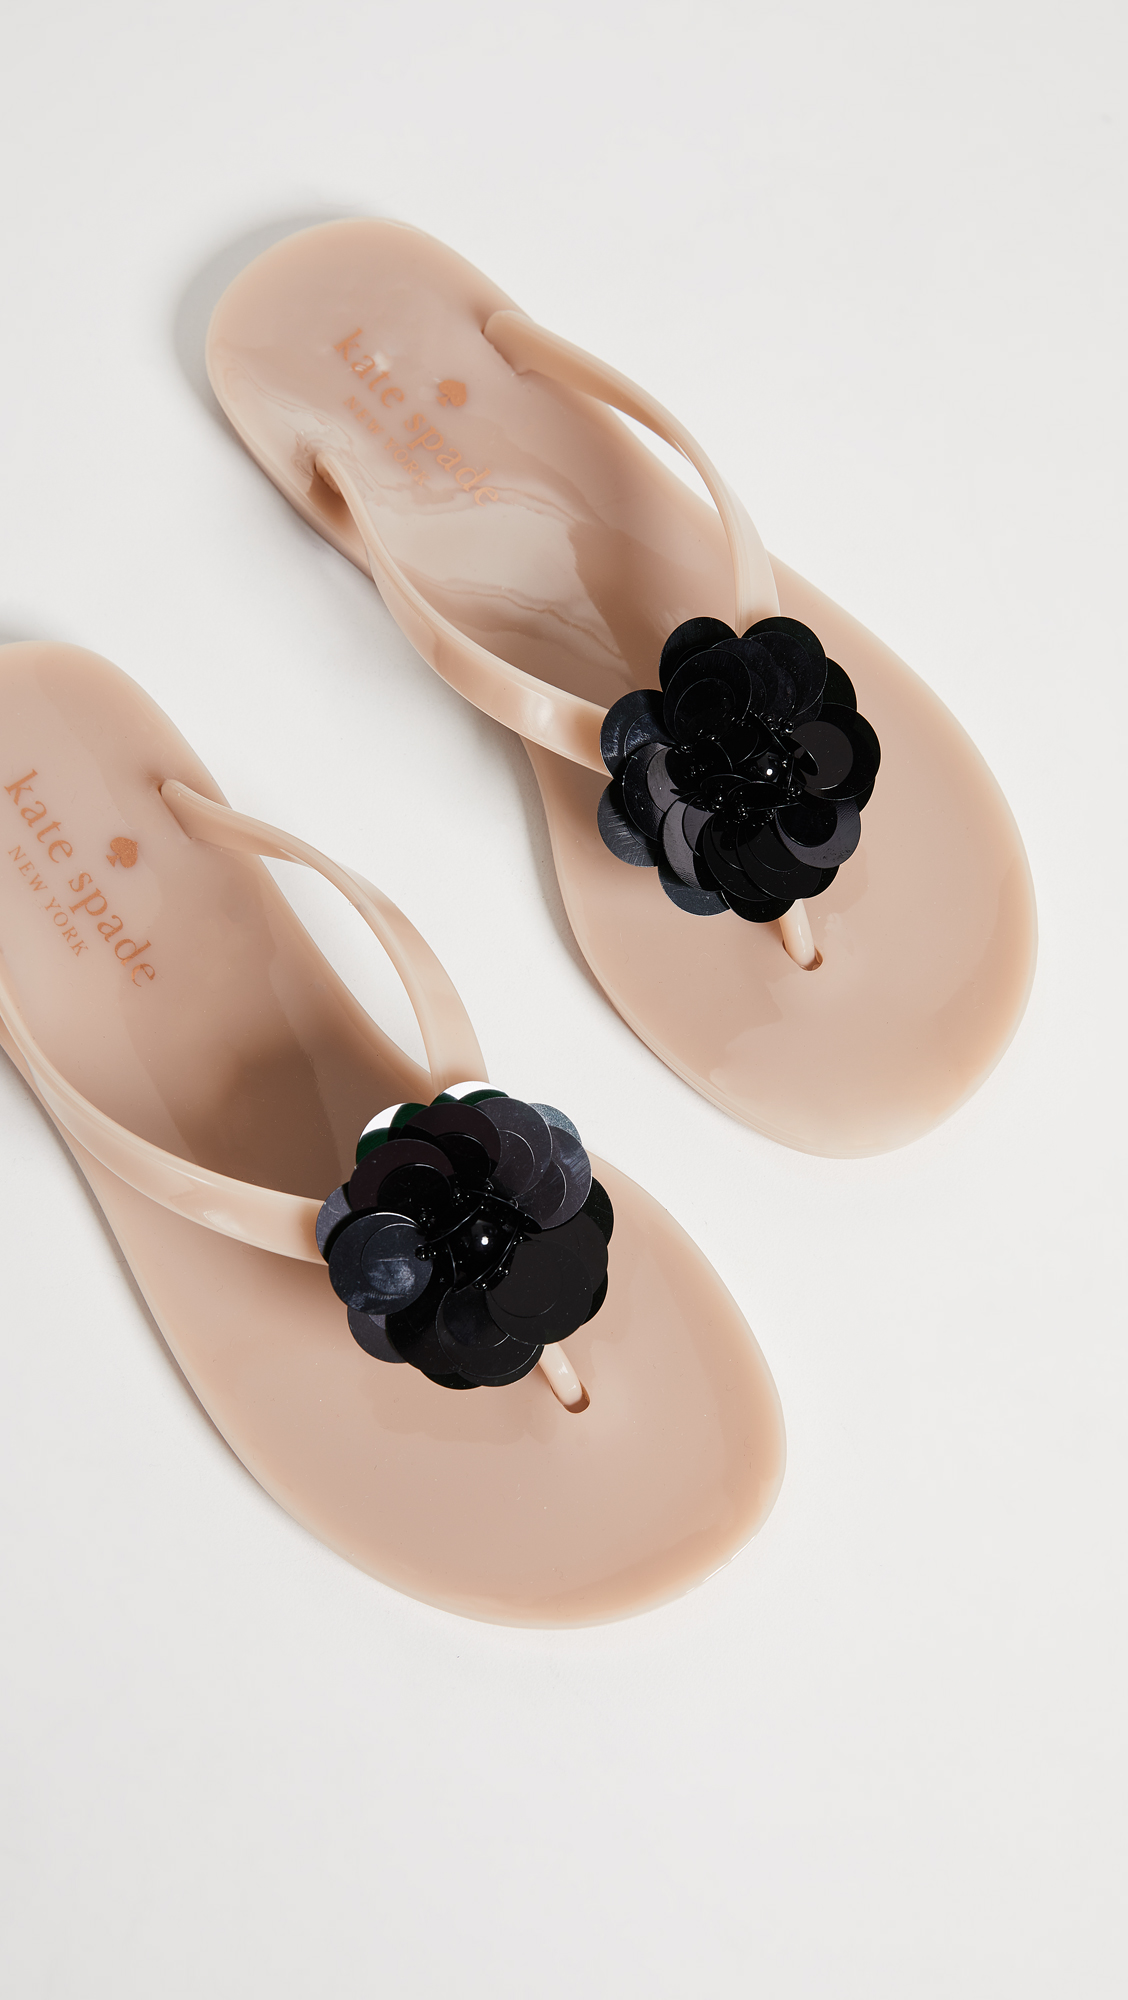 53ef84011ee9 Kate Spade New York Fiorina Floral Jelly Flip Flops